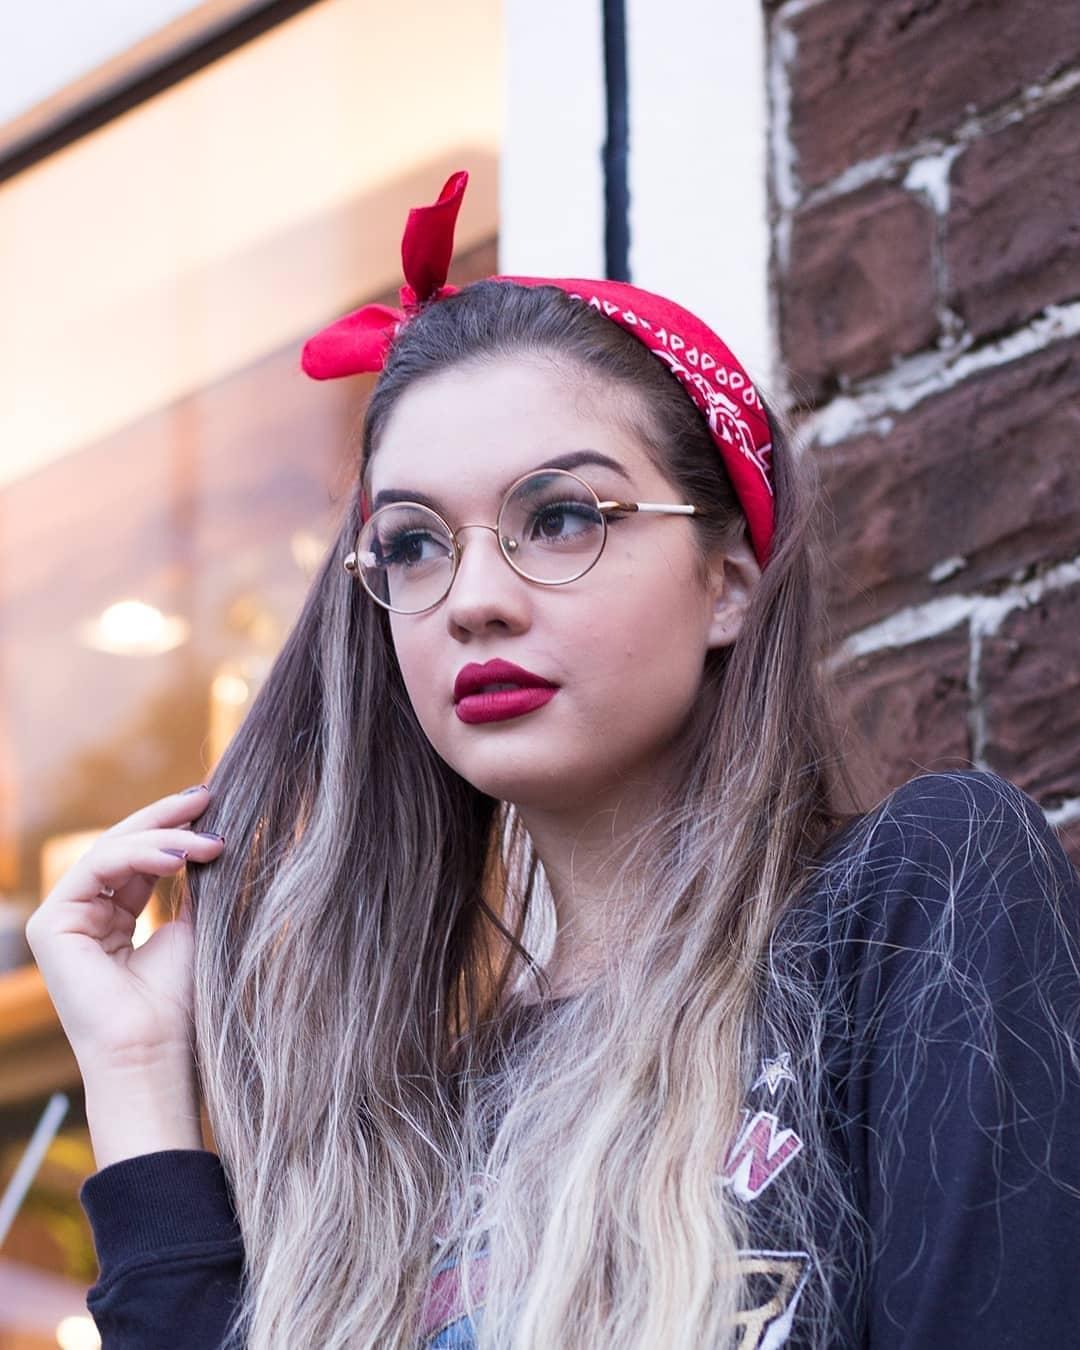 laura braga, candidata a miss fortaleza 2019. - Página 2 32079110